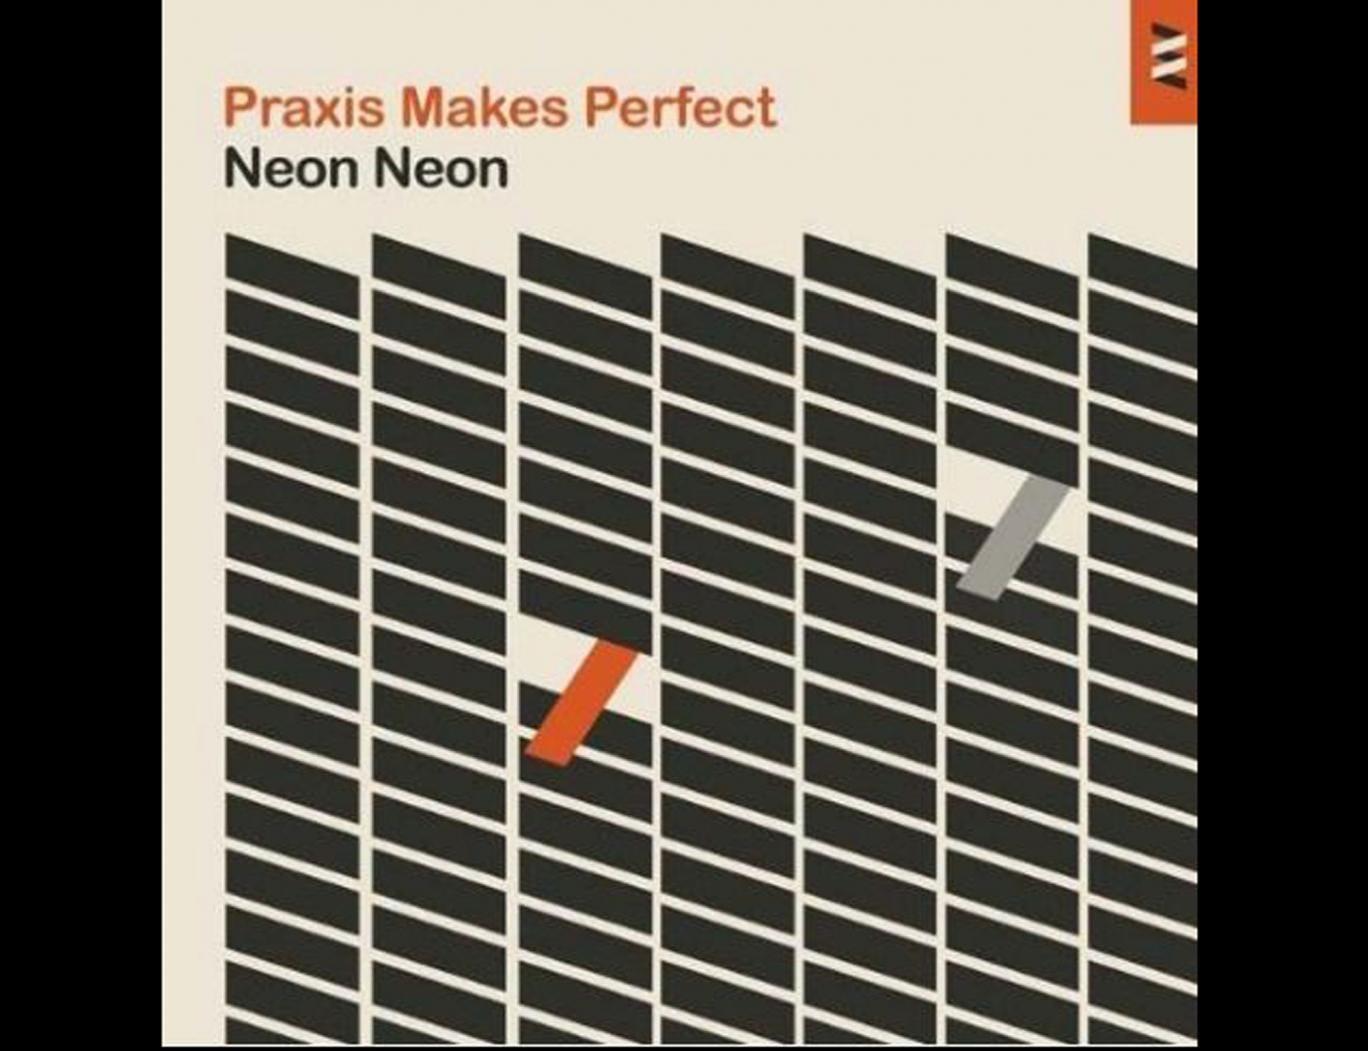 Neon Neon, Praxis Makes Perfect (Lex)